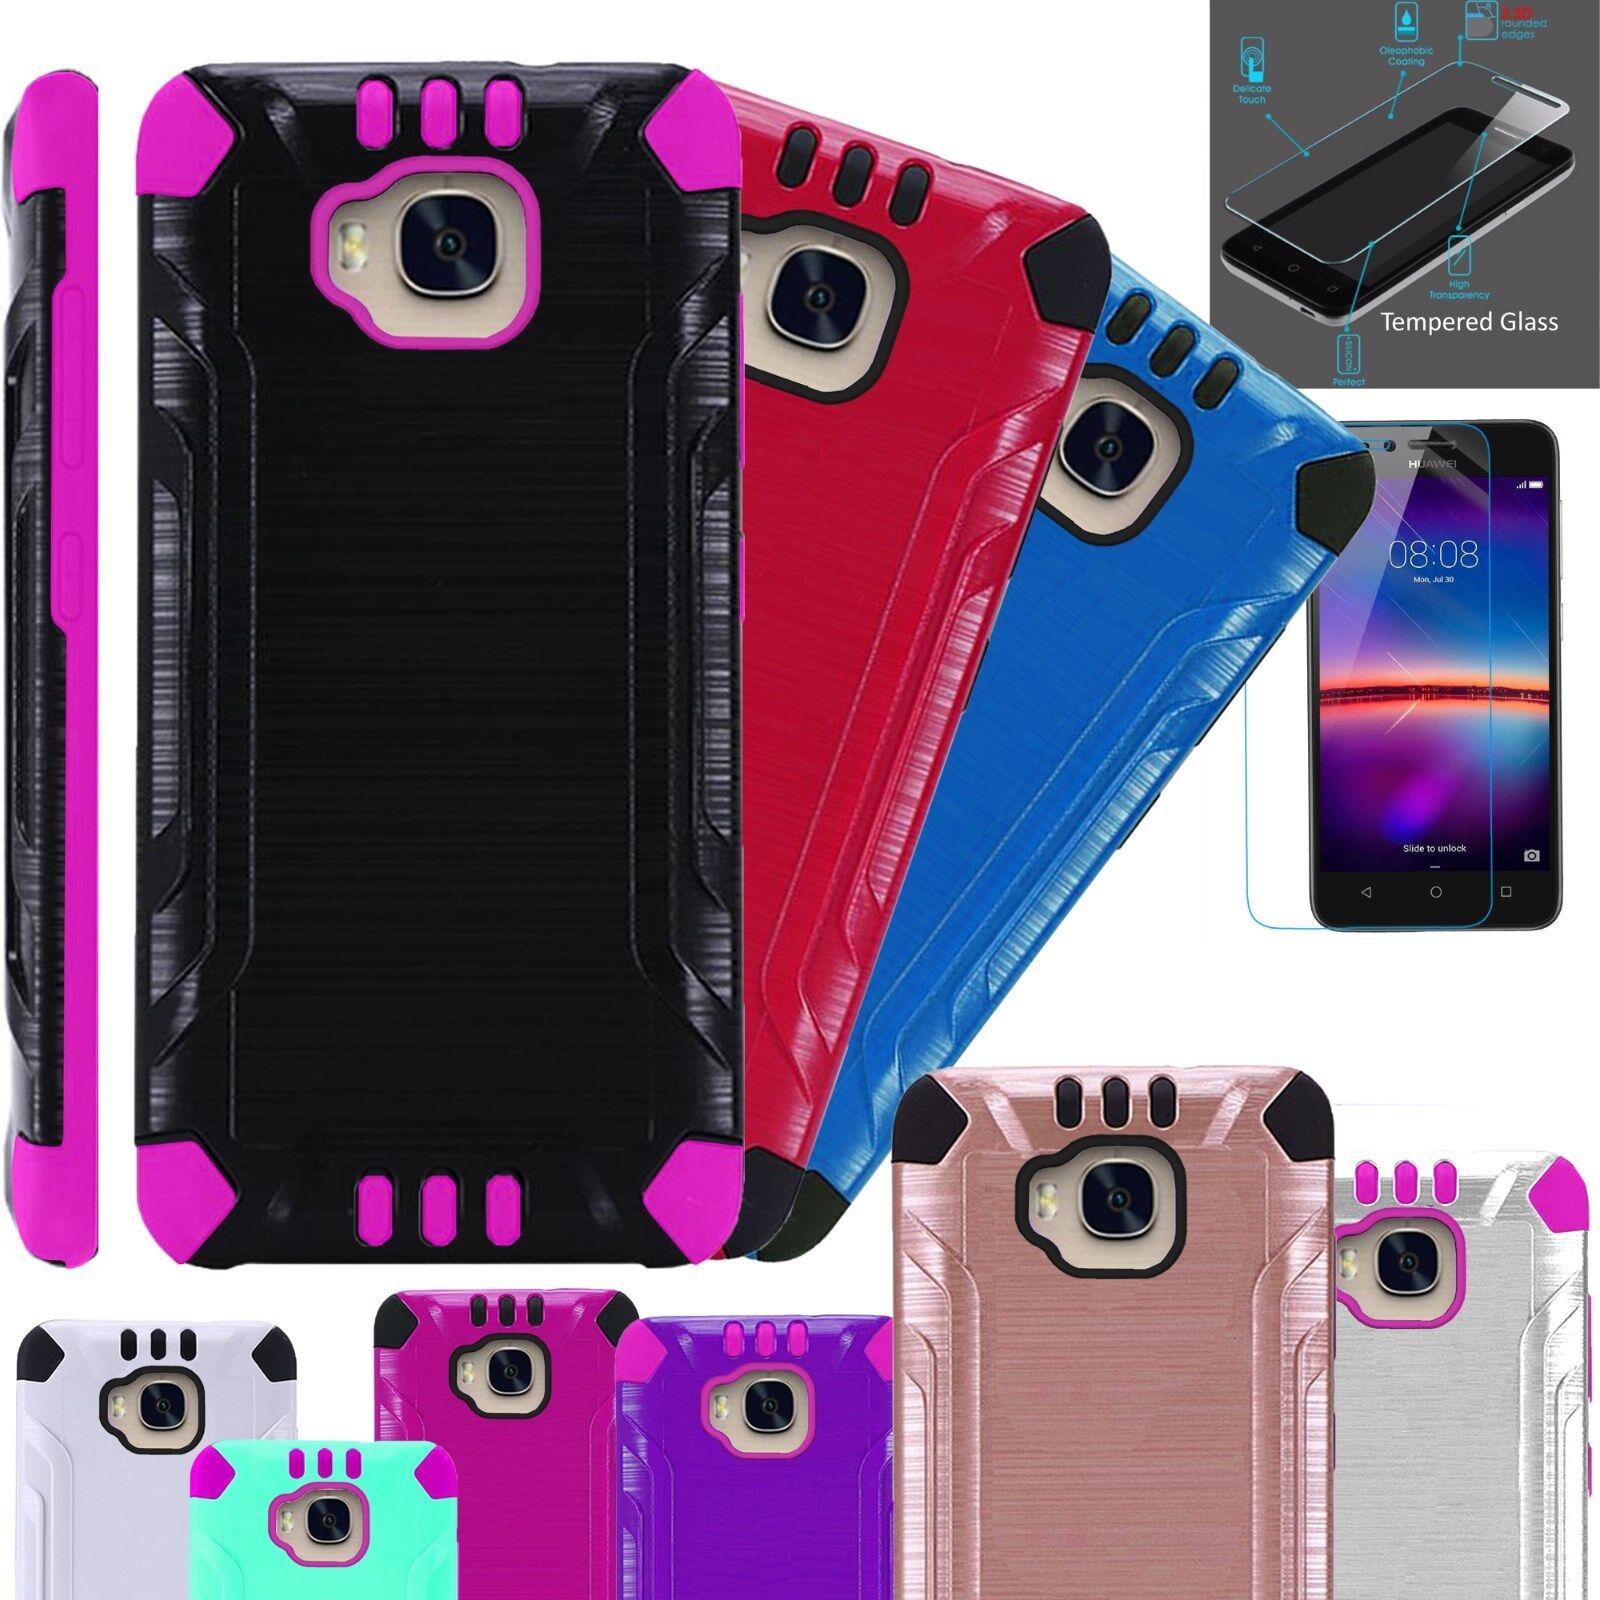 Купить HR Wireless - Huawei Ascend XT Phone Case Cover + TEMPERED GLASS SCREEN PROTECTOR Kombatguard